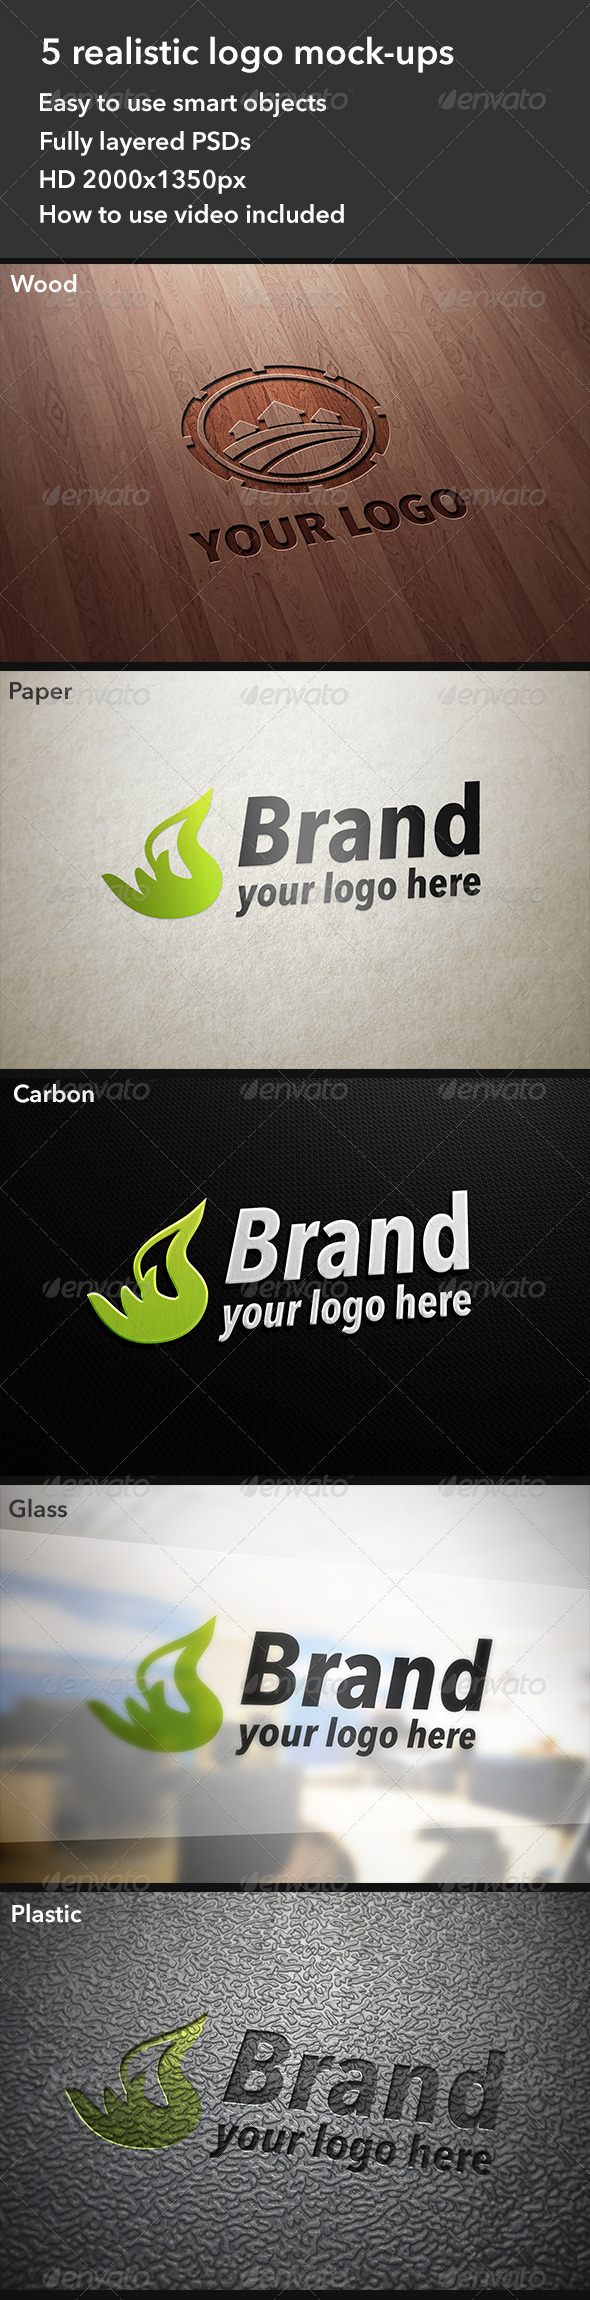 GraphicRiver 5 Realistic Logo Mockups 4431670